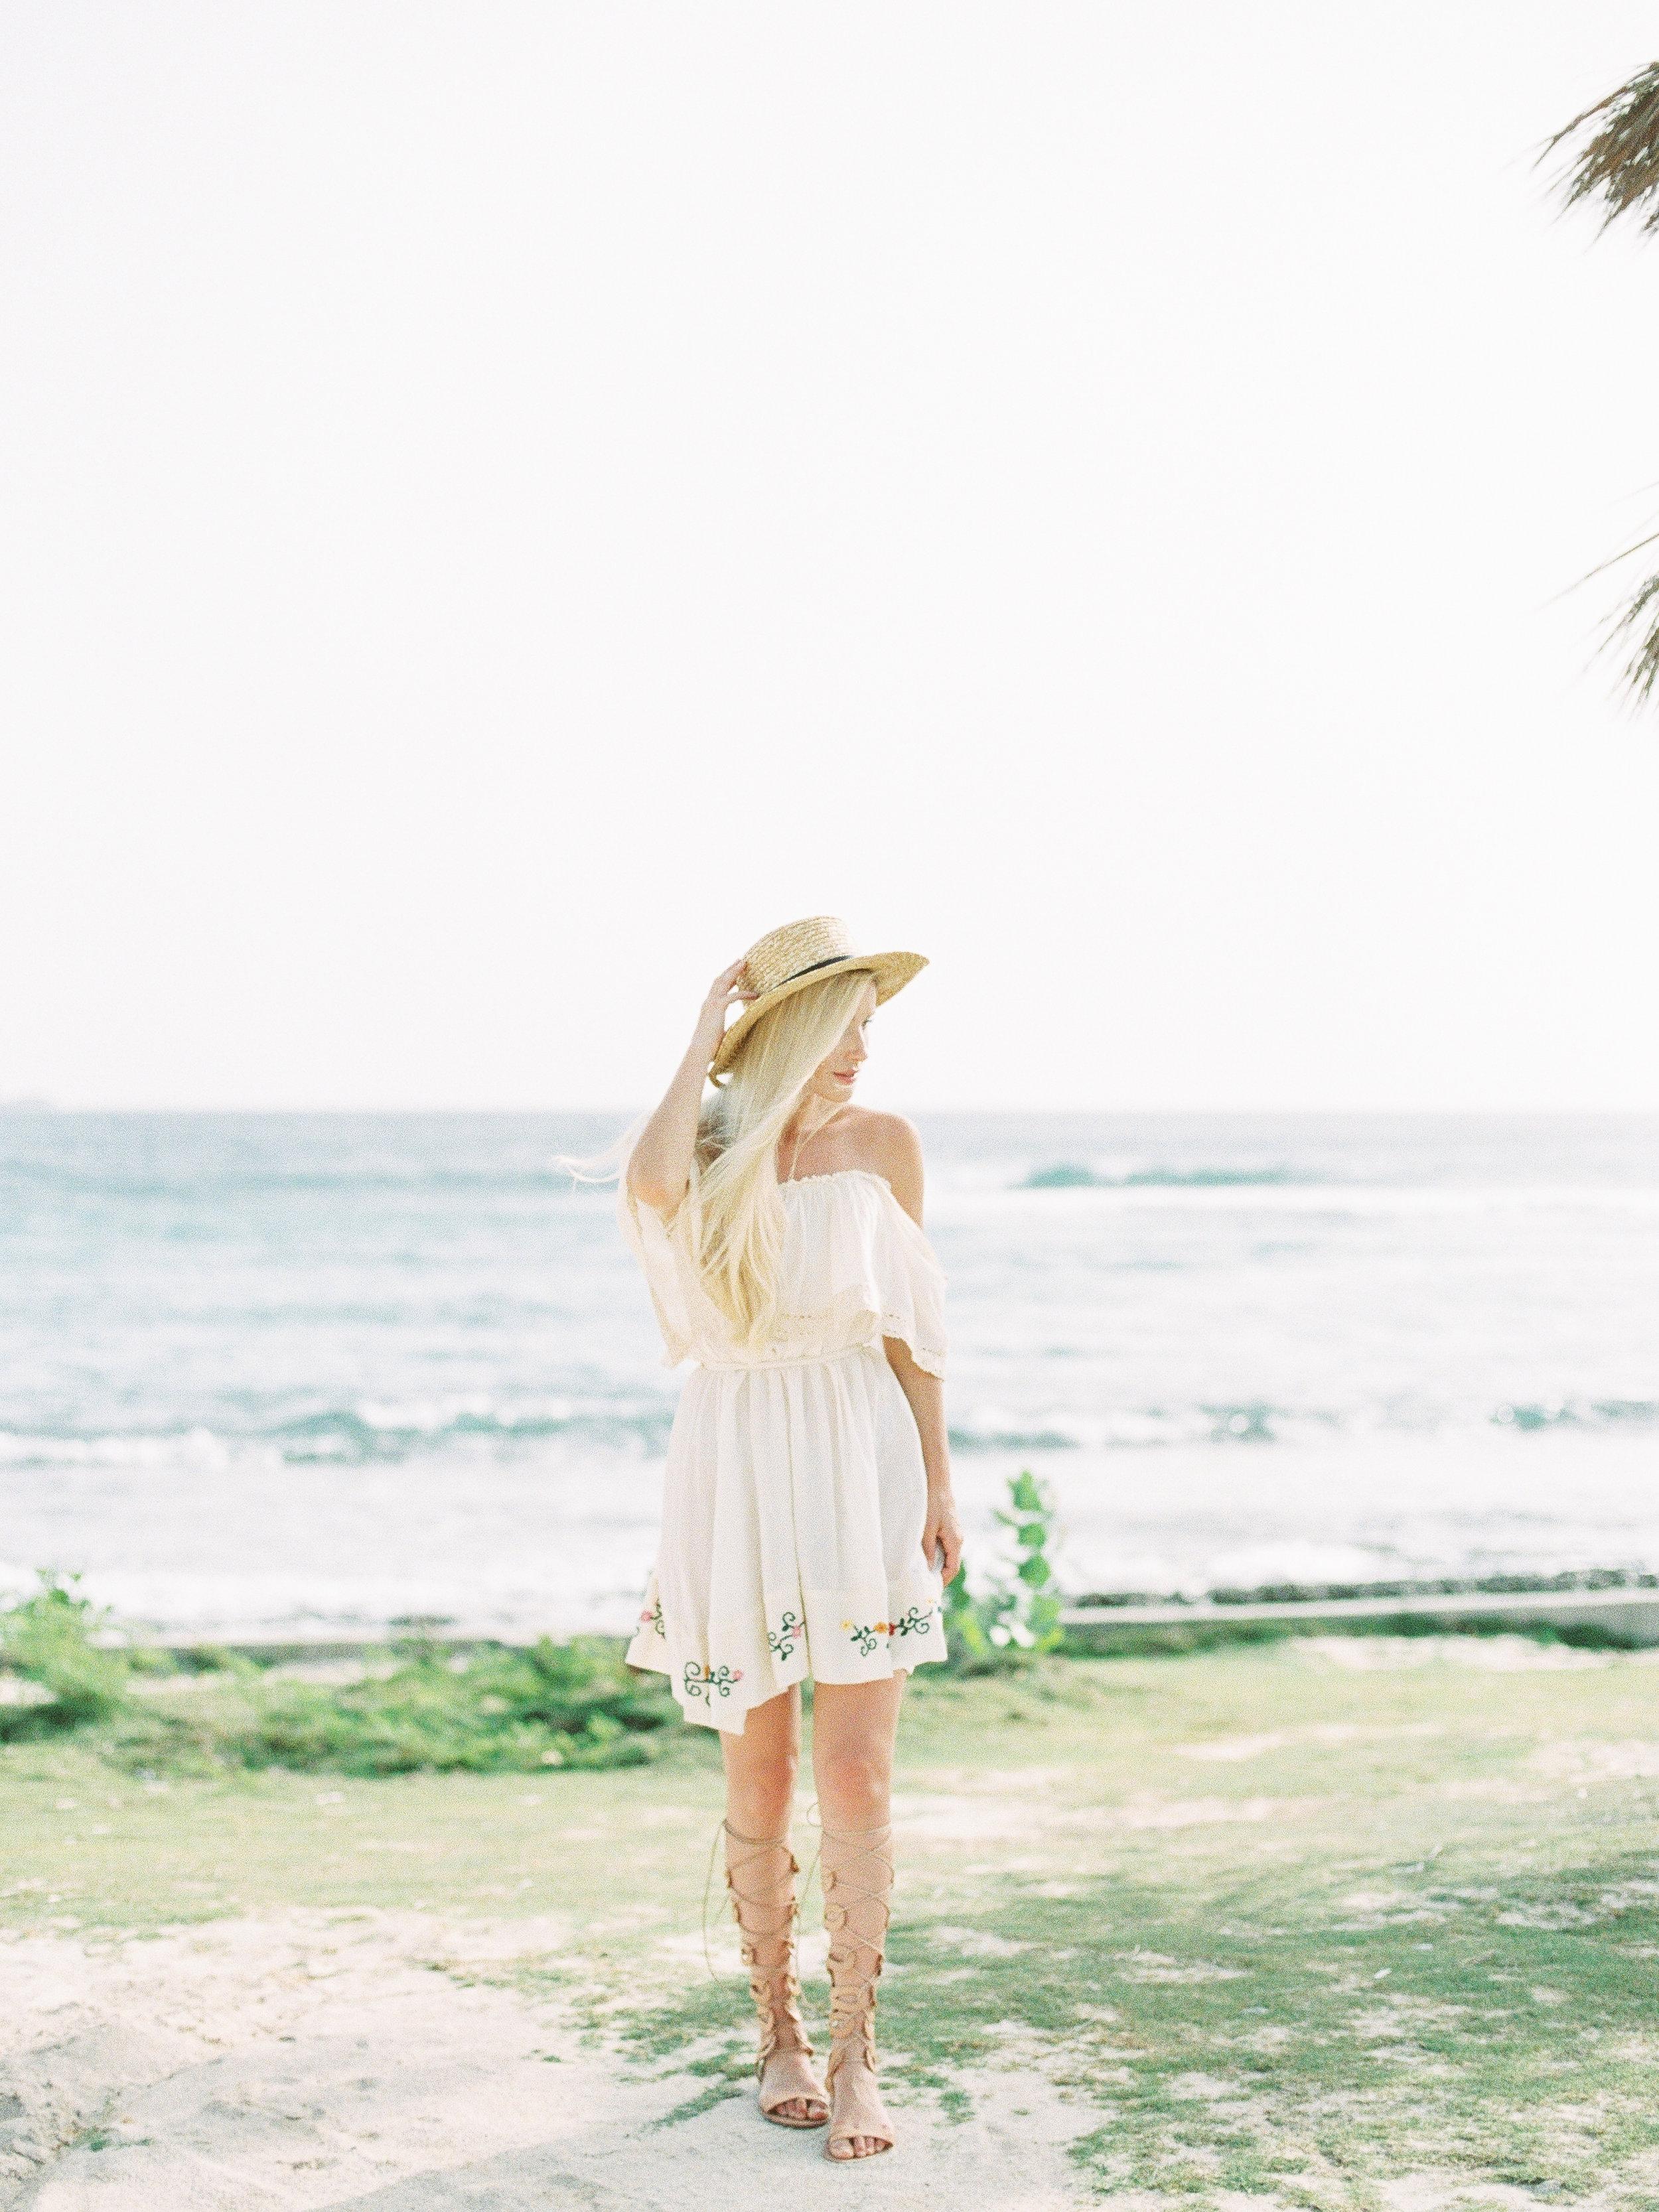 St. Barth's Vacation Travel Blog - Rachel Owens Photography -10.jpg